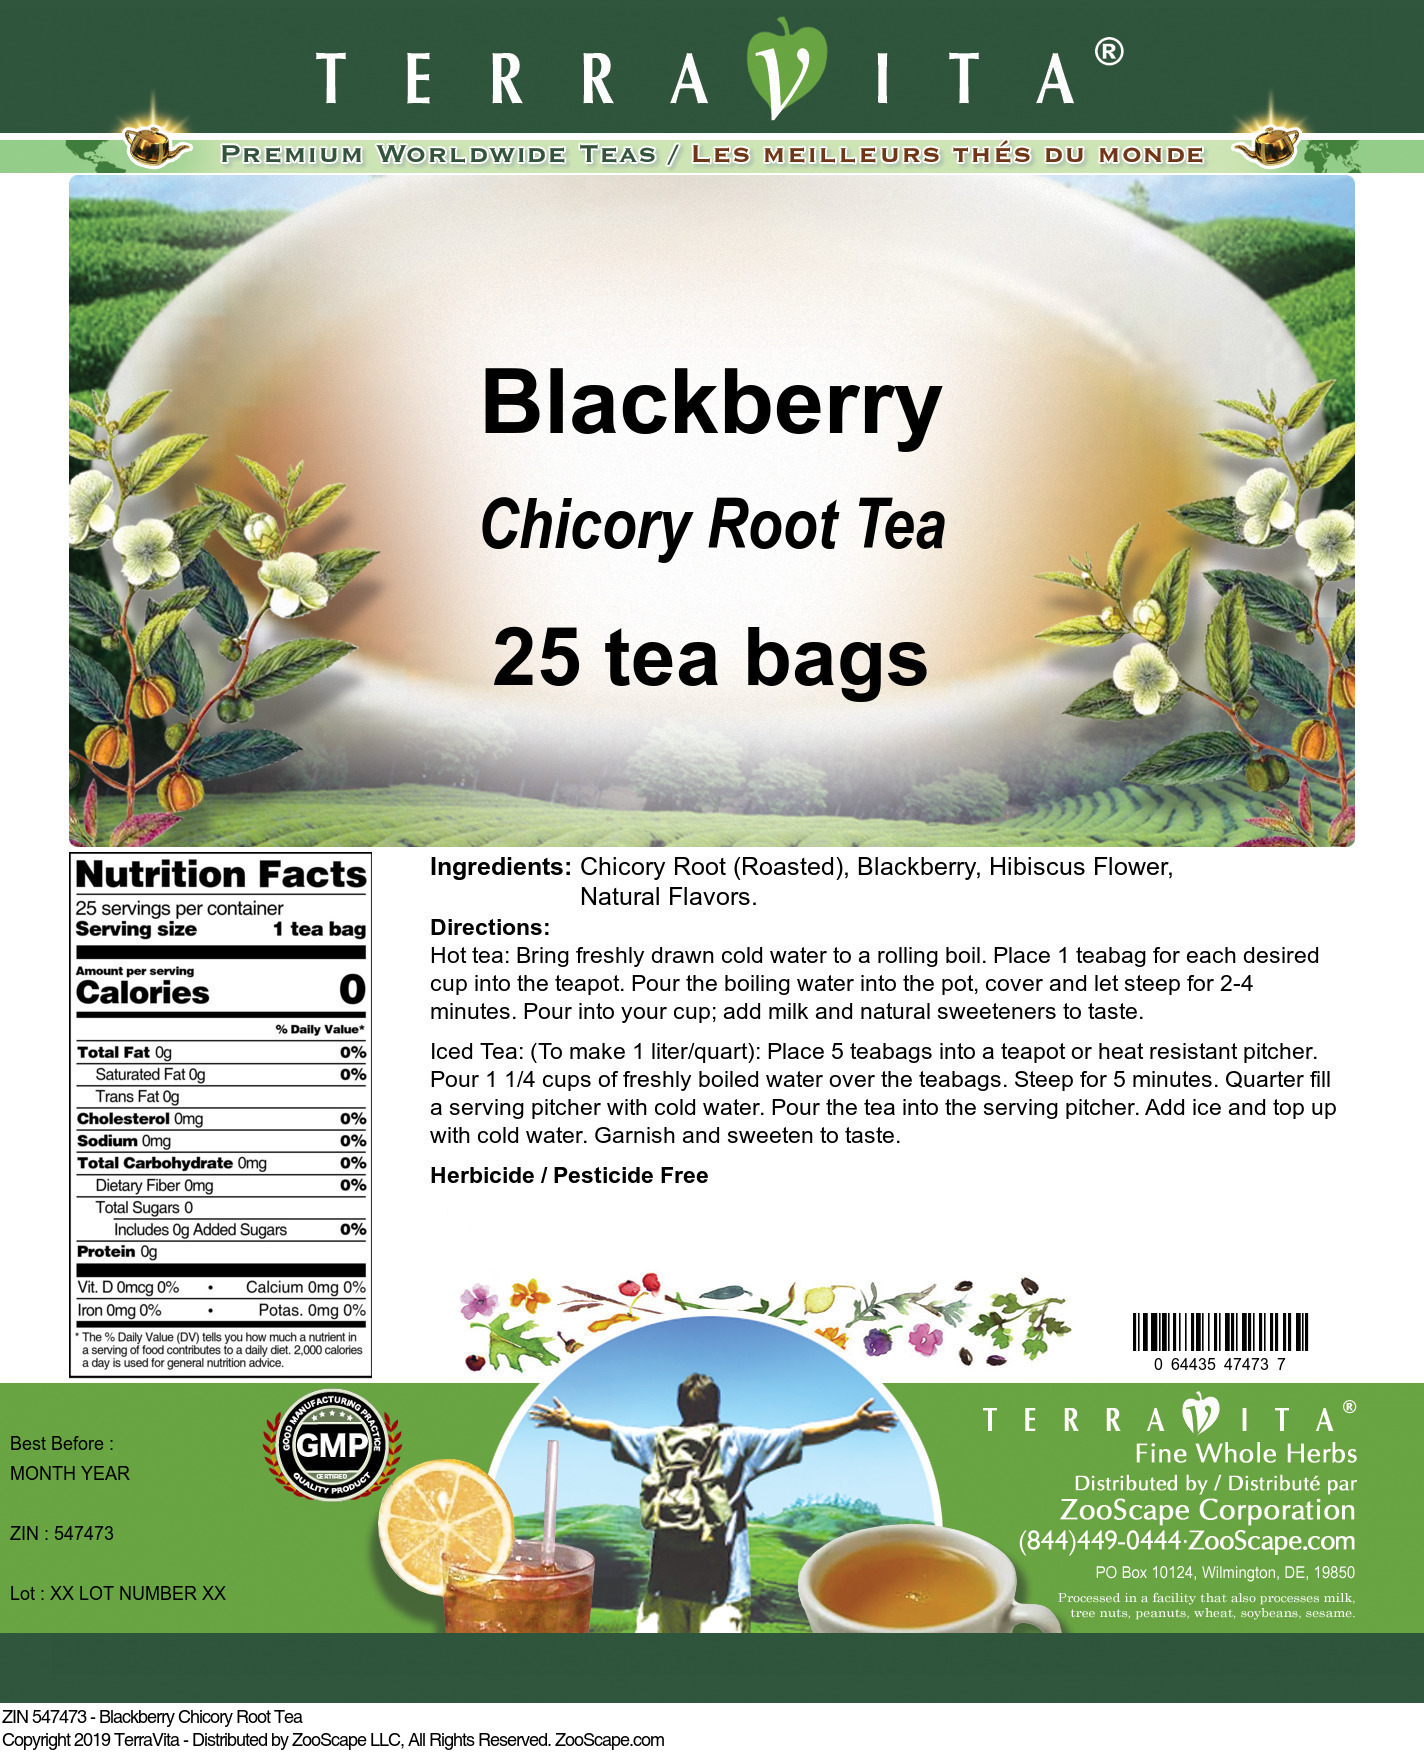 Blackberry Chicory Root